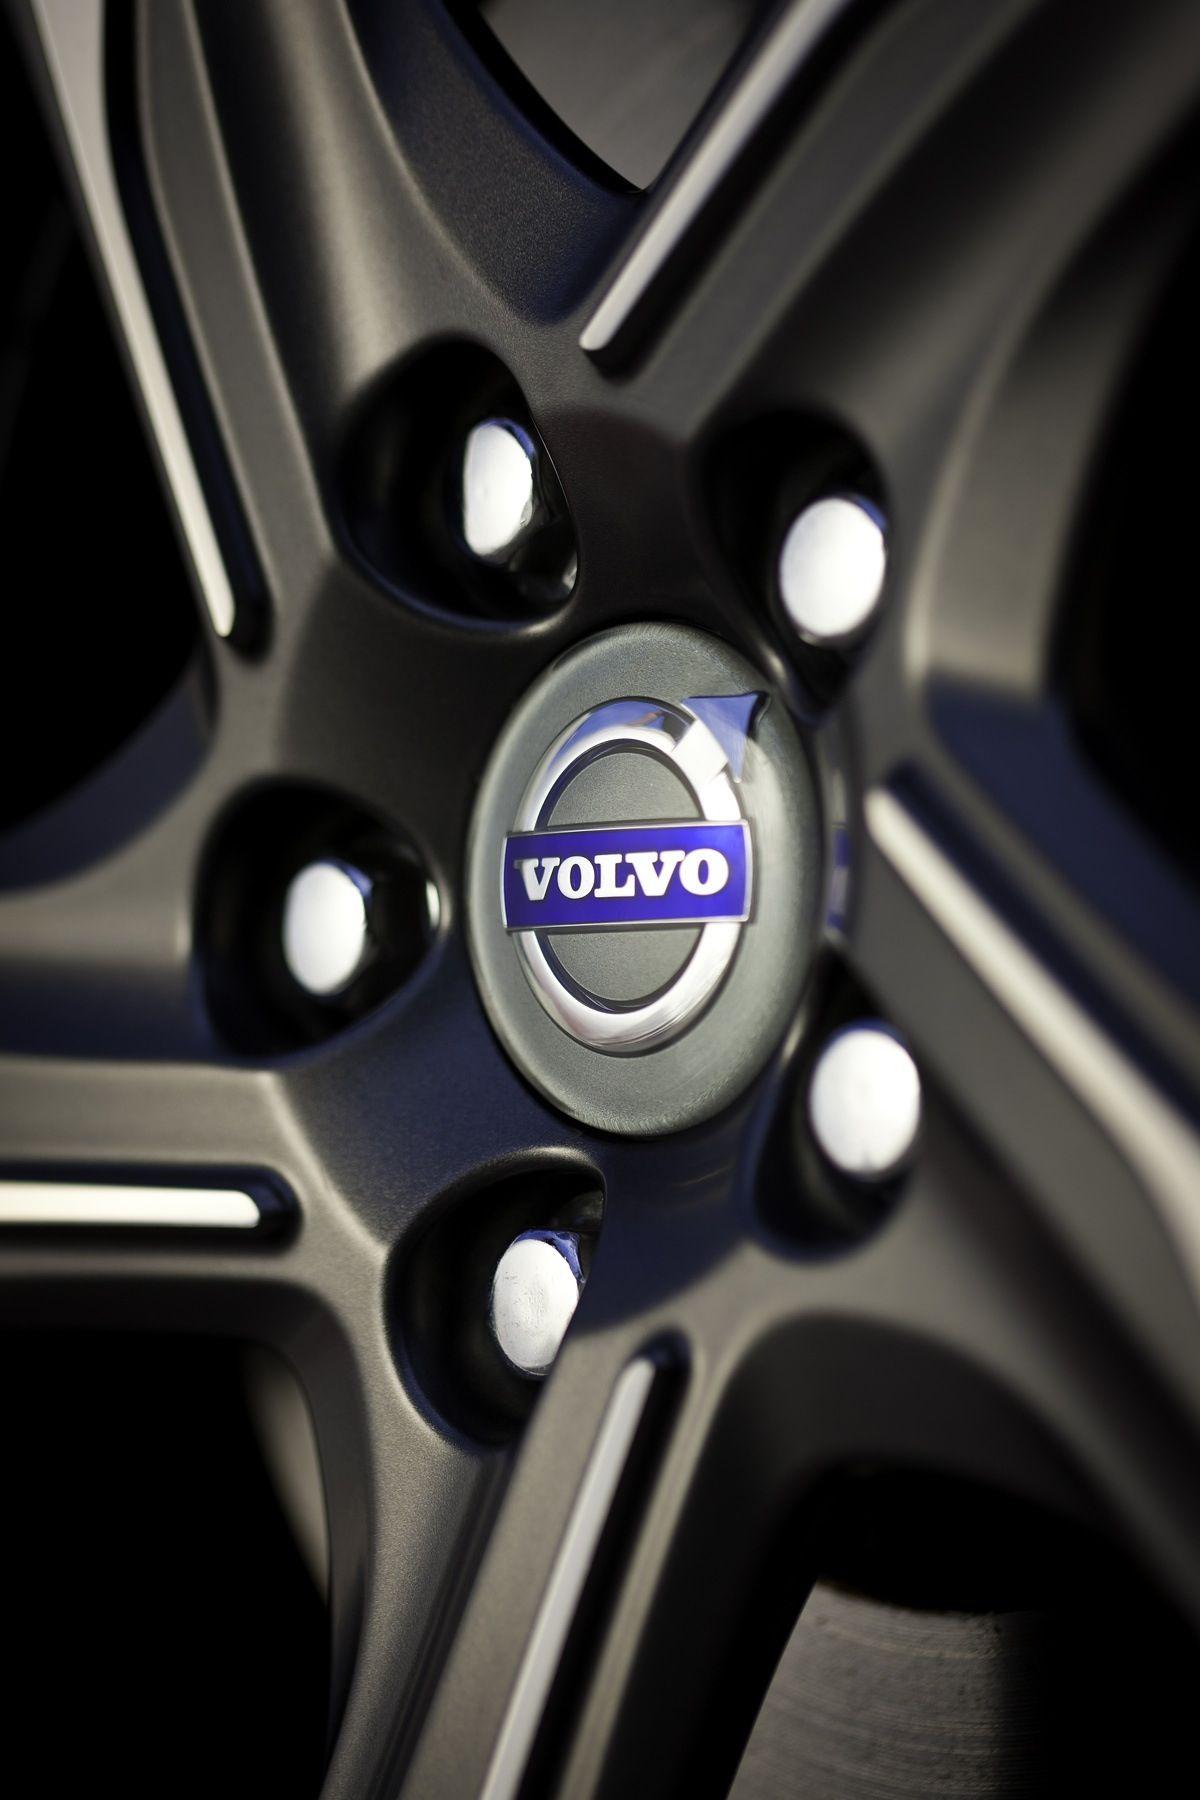 Rrrrrrr Wheels Watches And Cars Volvo V40 Volvo Volvo Cars